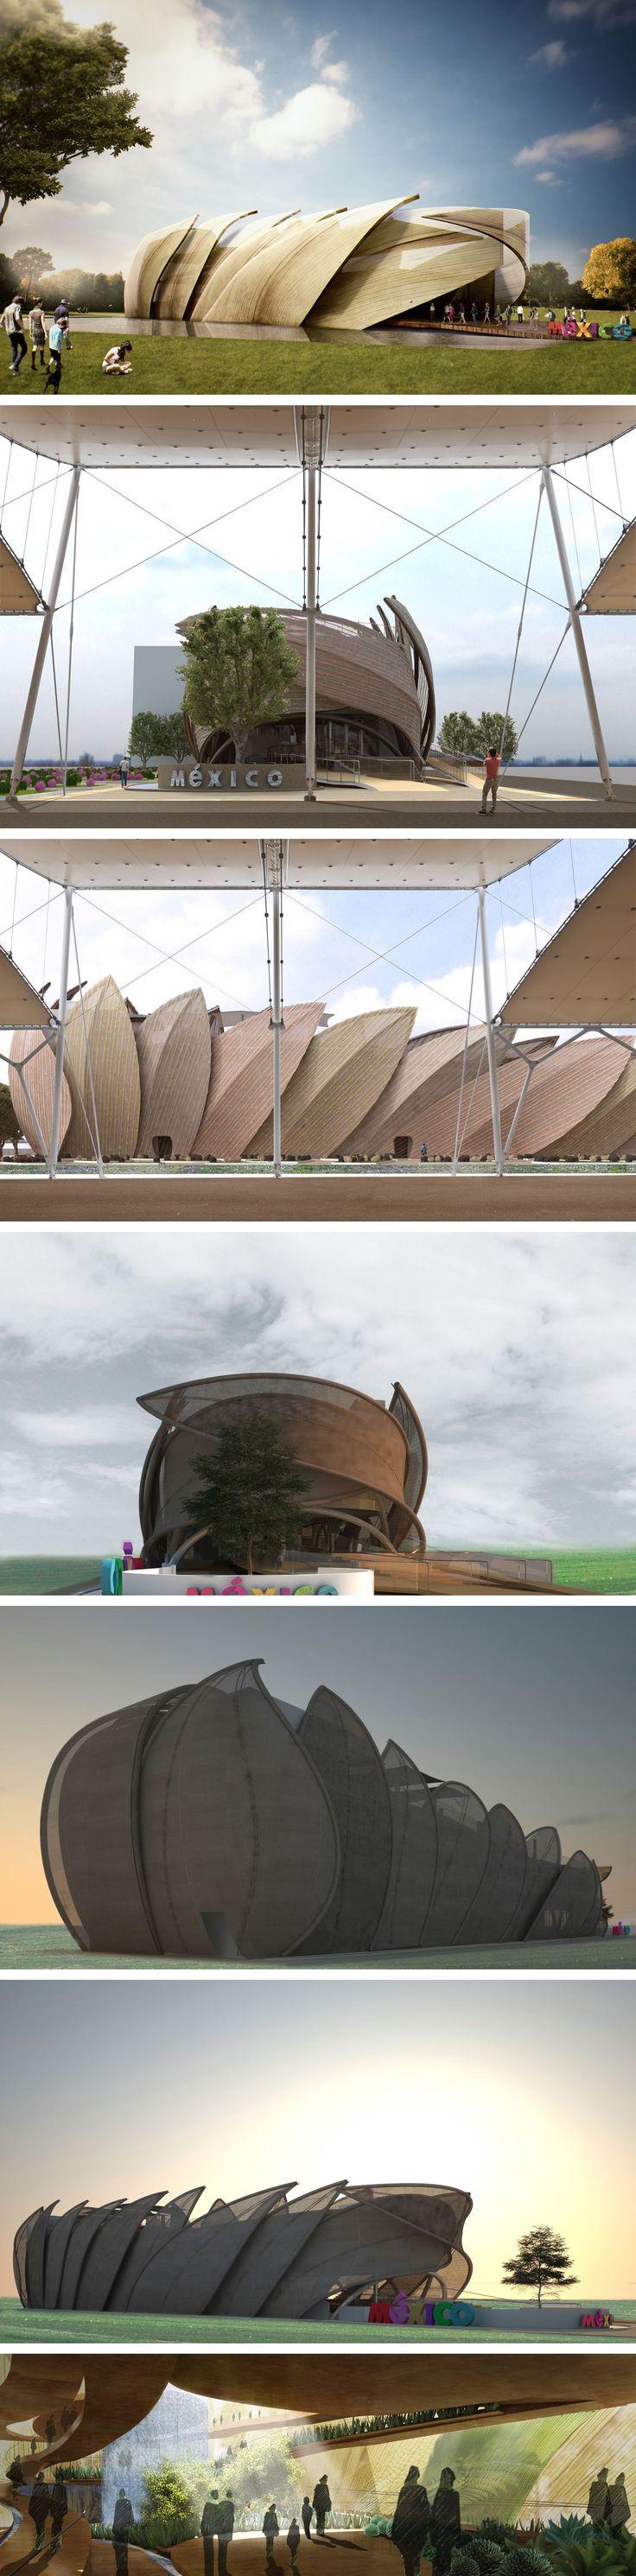 Mexico Pavilion at @Expo2015Milano , 2015 - Loguer Design #expo2015 #mexico #pavilion #architecture